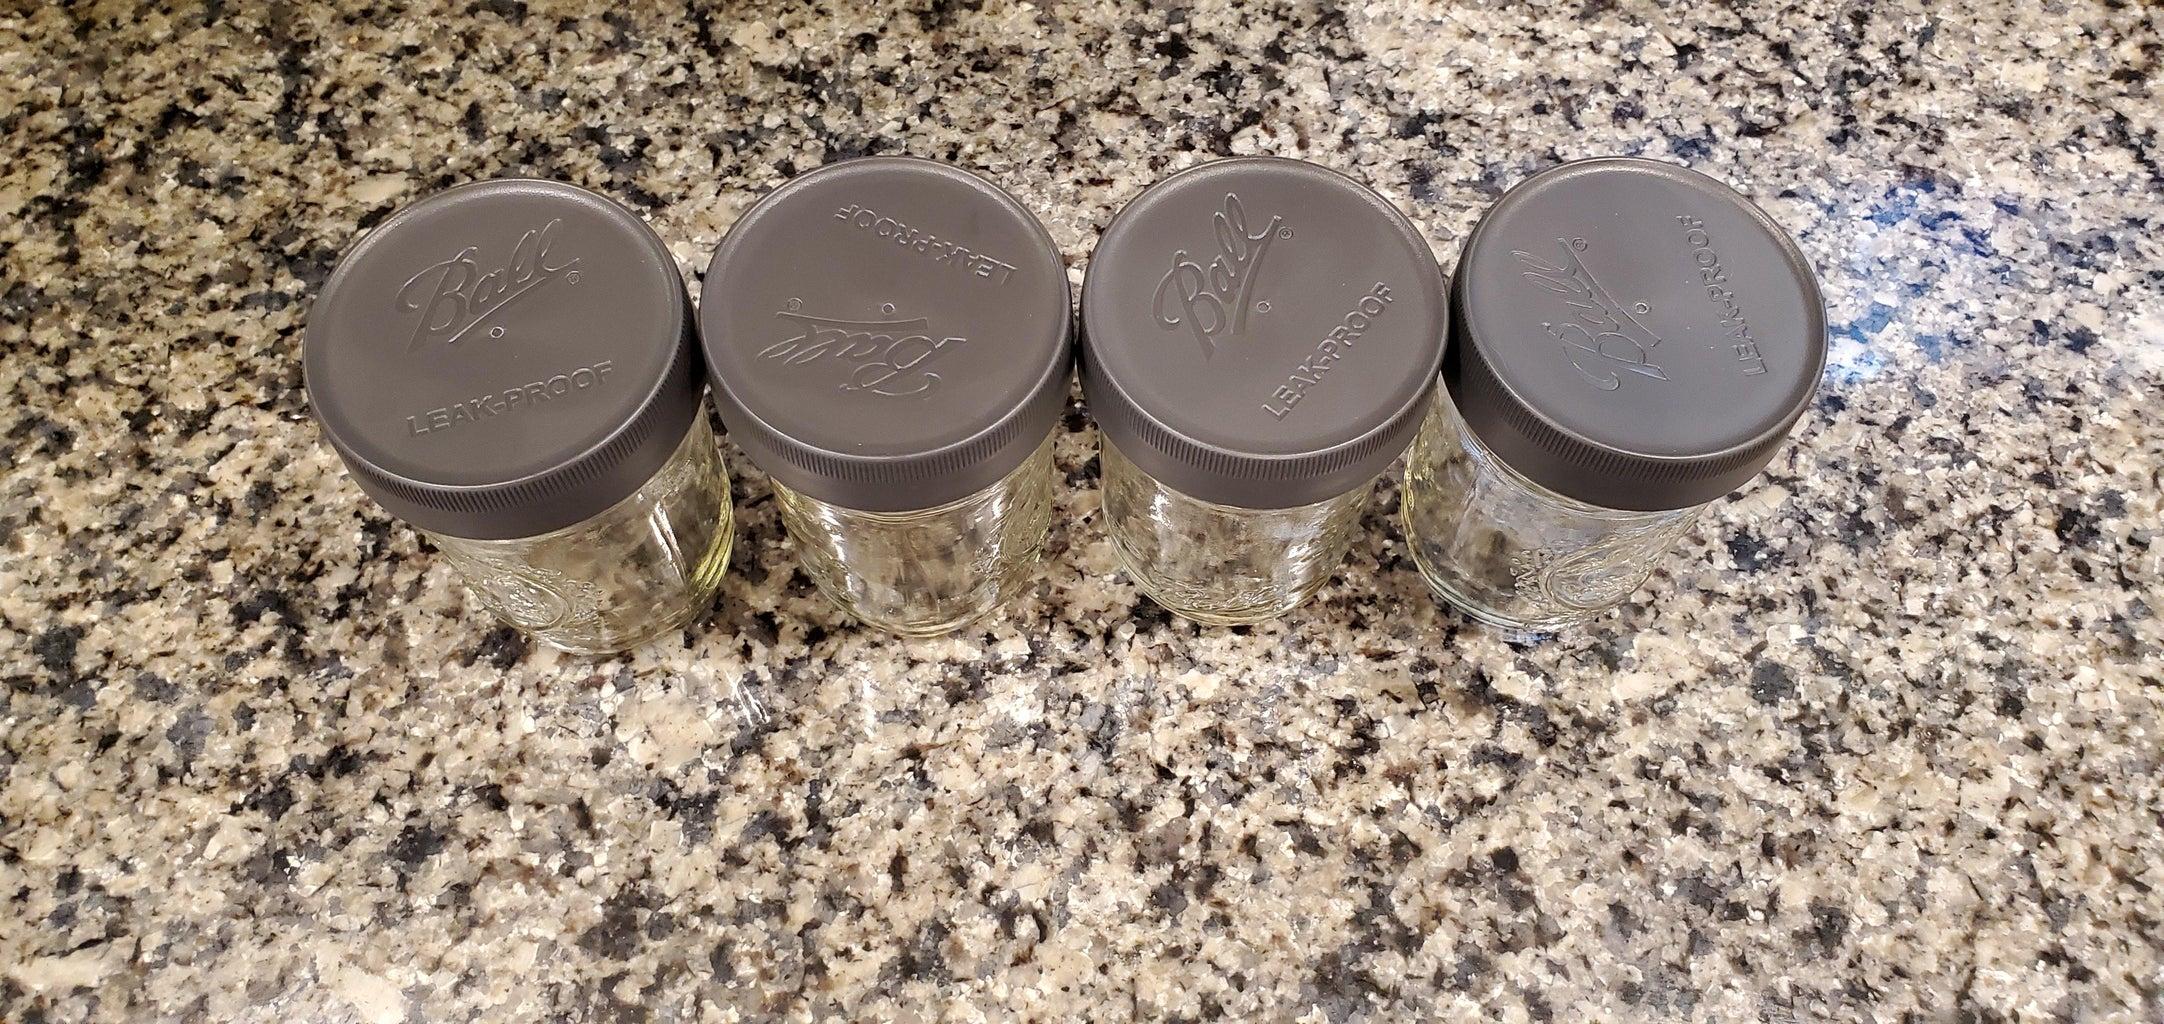 Preparing Jars